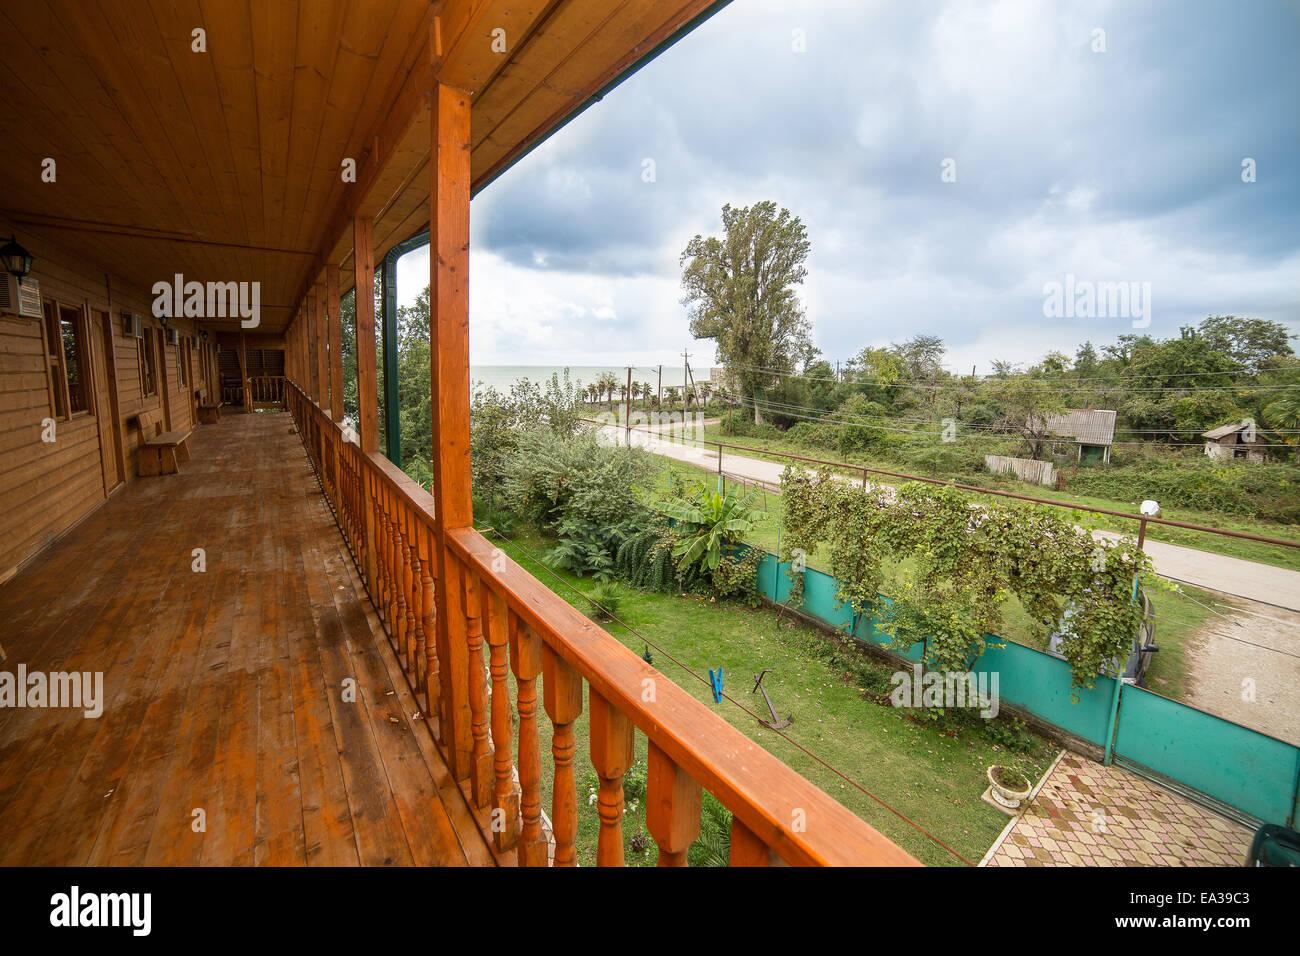 Hotel veranda, Gudauta, Abkhazia - Stock Image